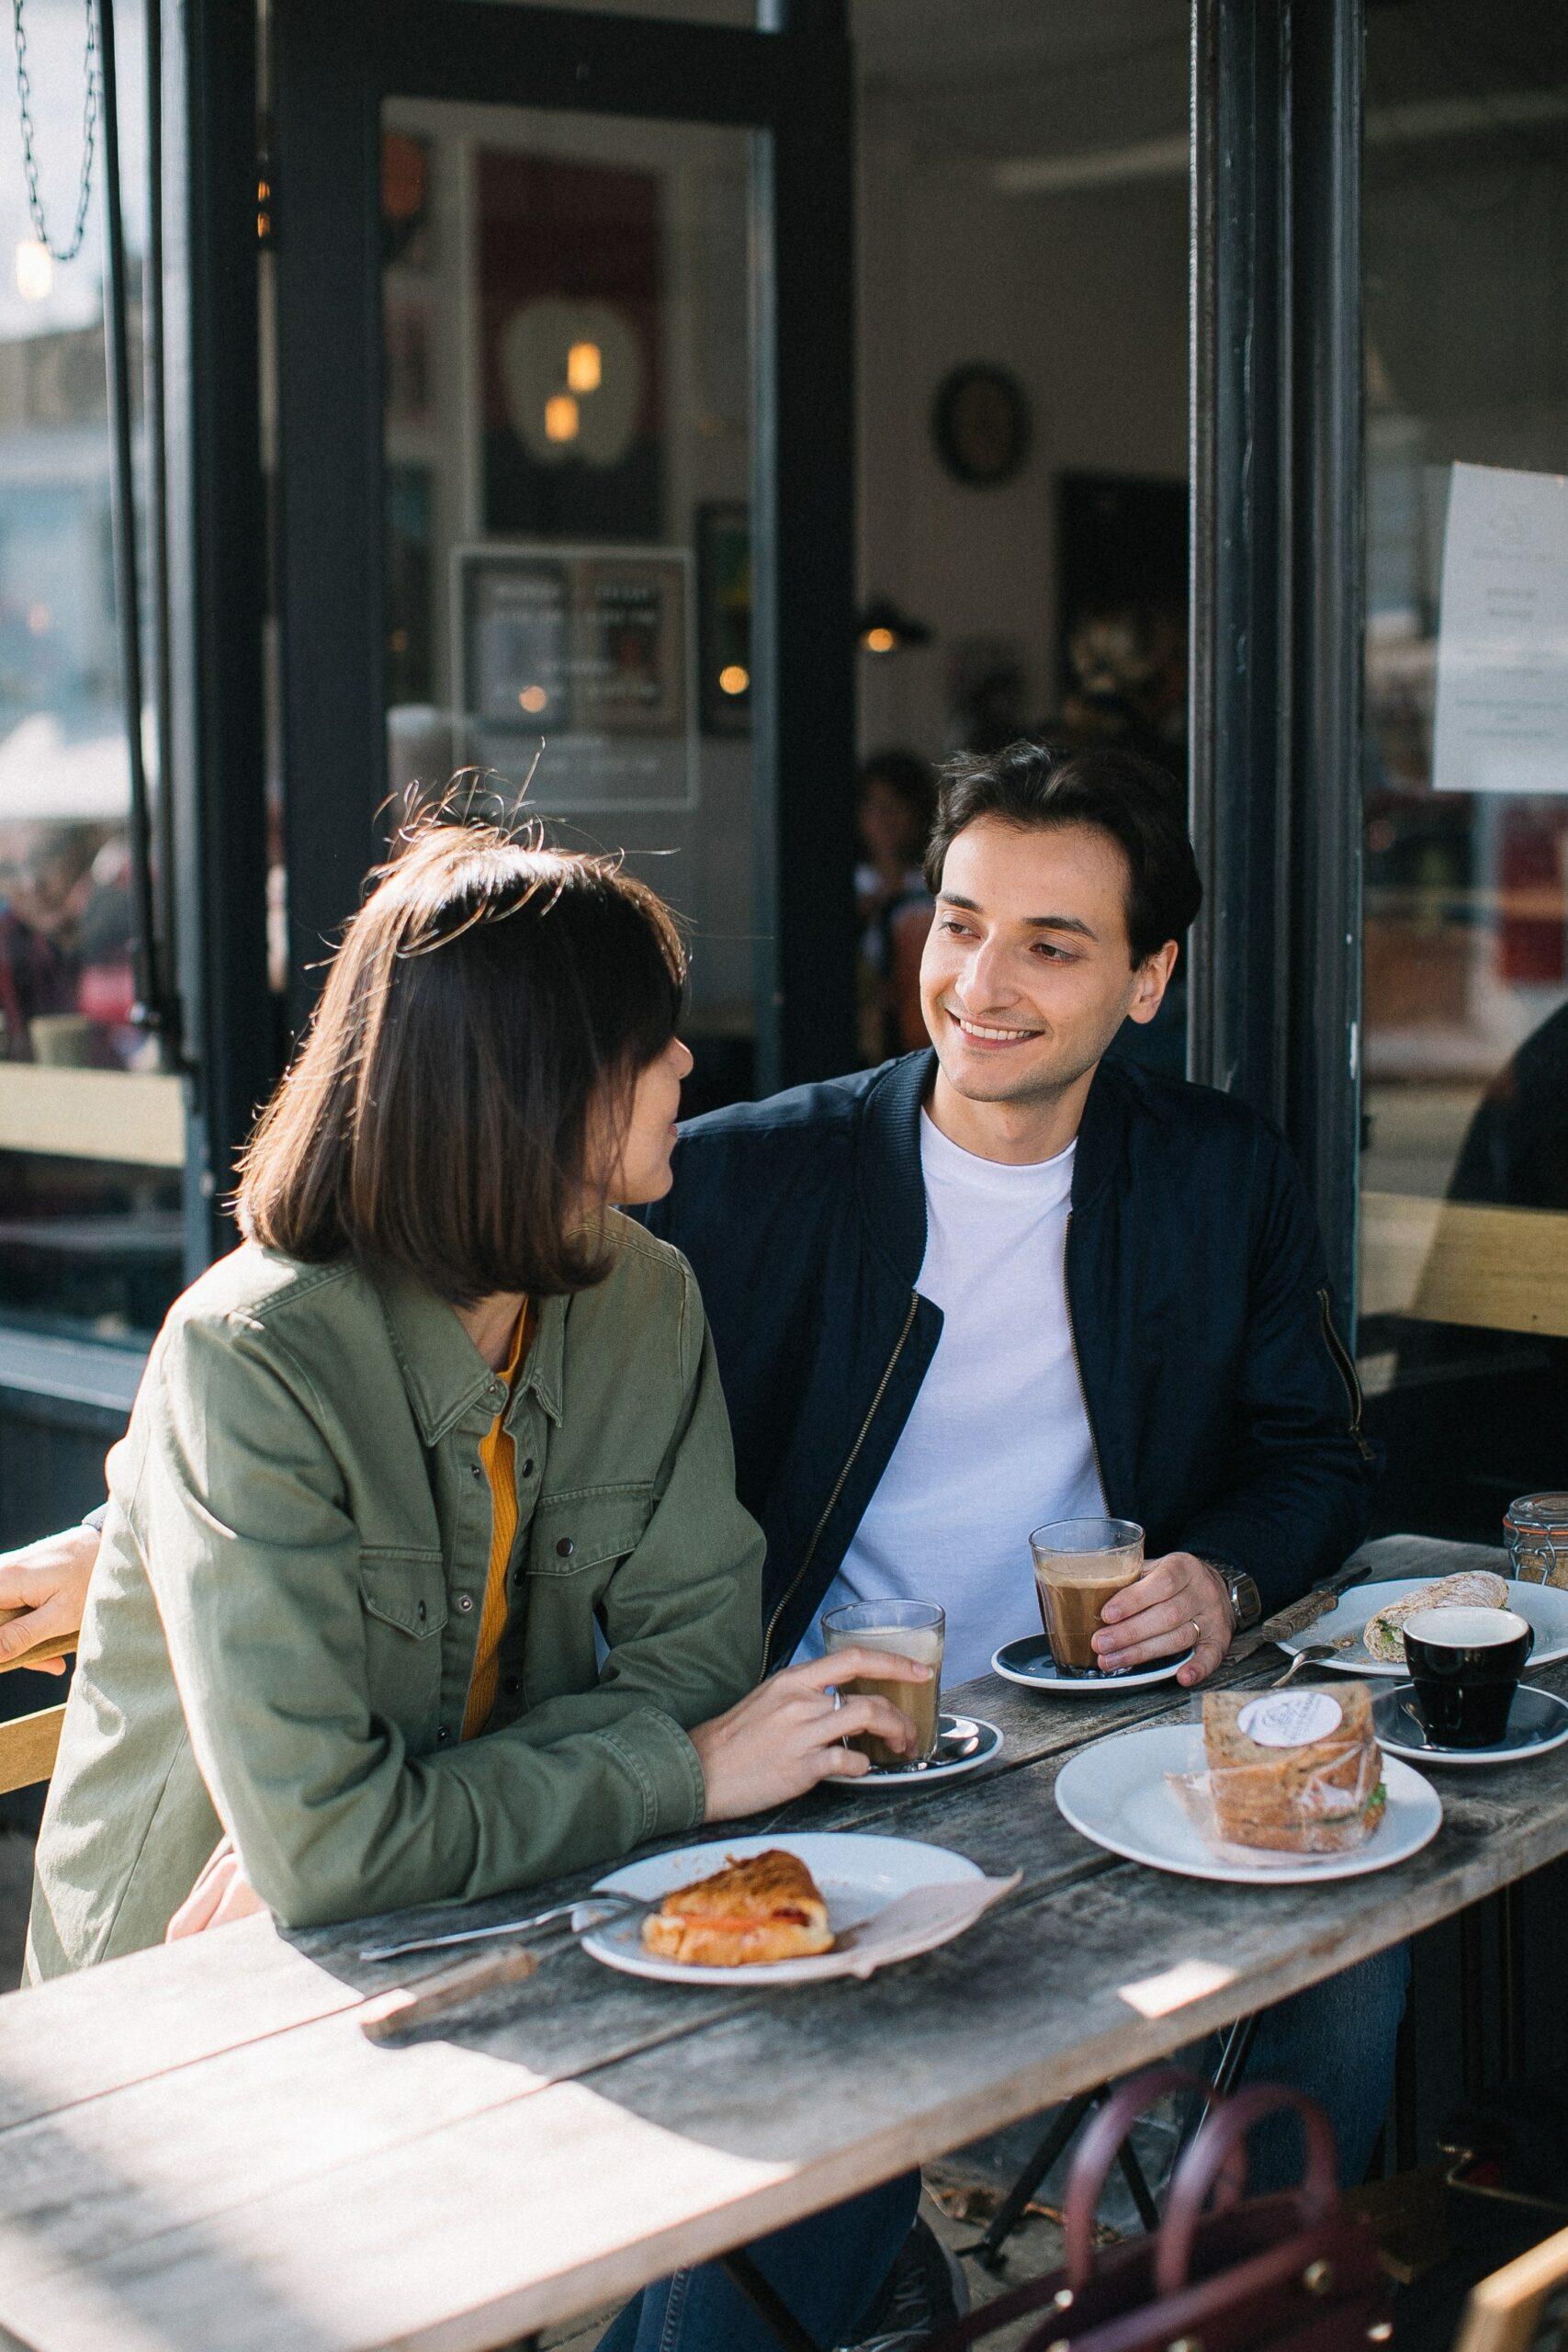 Analytics to Build Closer Customer Relationships